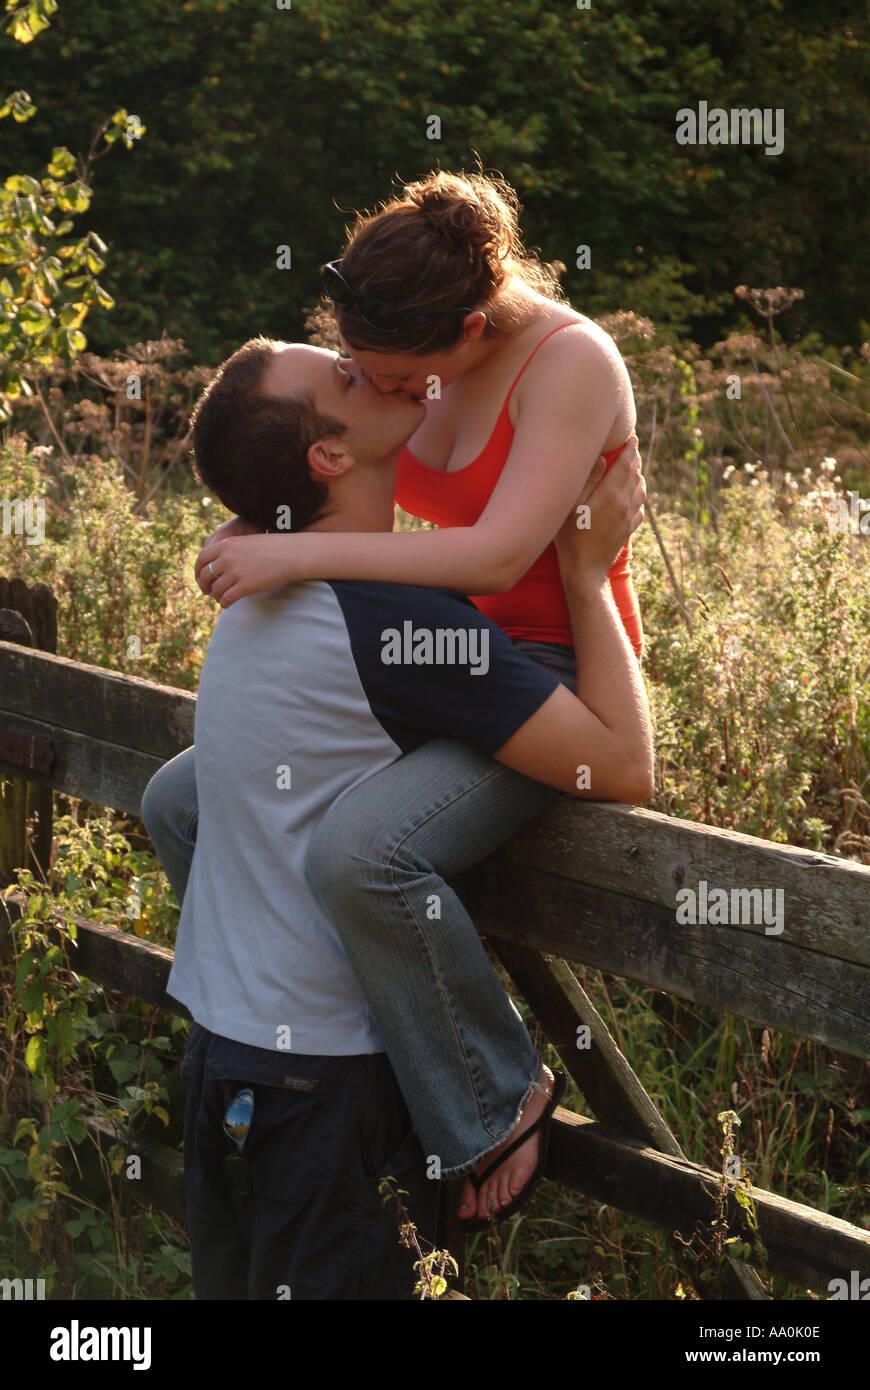 Kissing gates dating